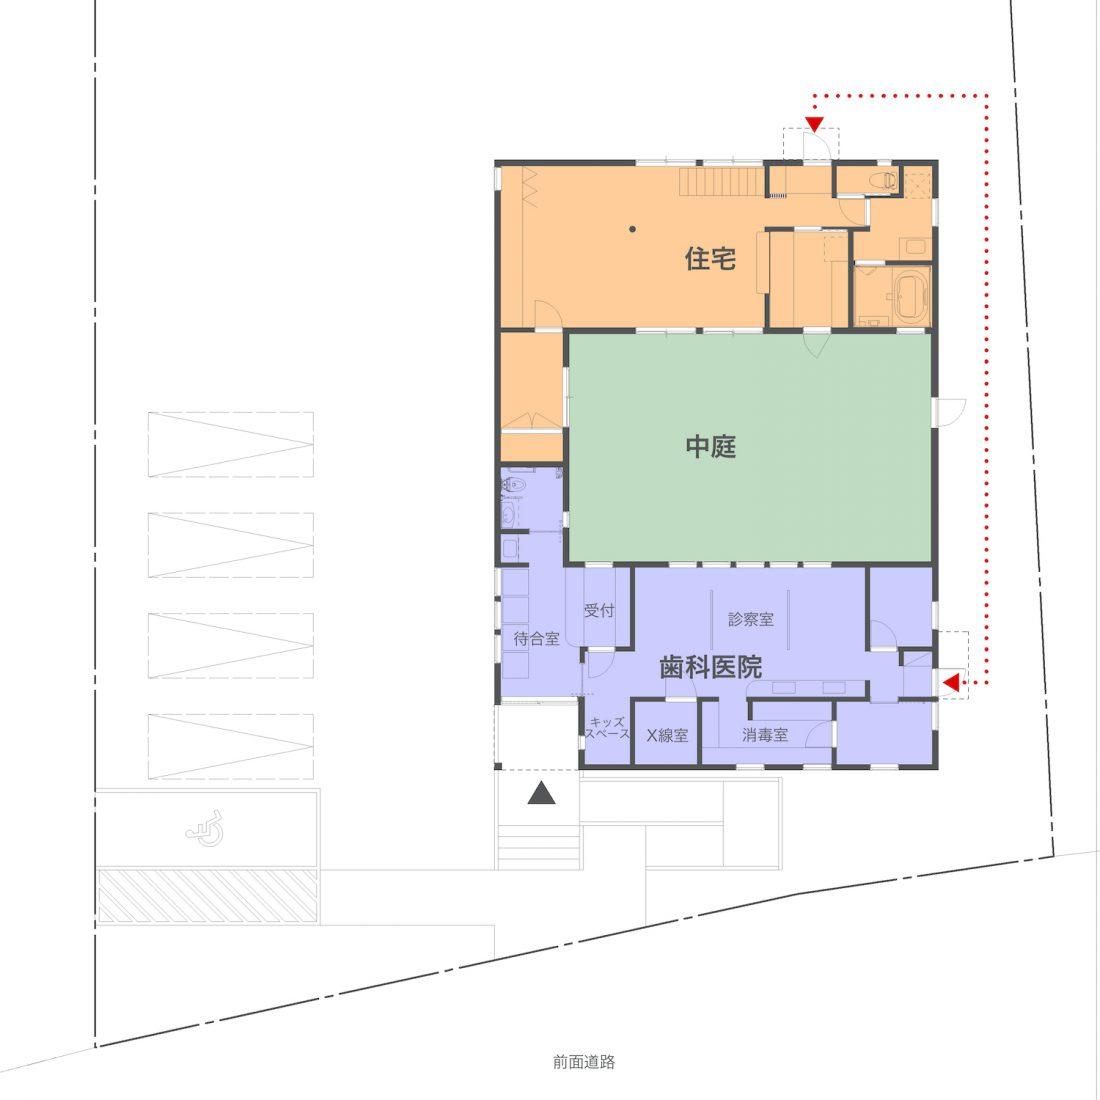 歯科医院併用住宅平屋間取りプラン平面設計図